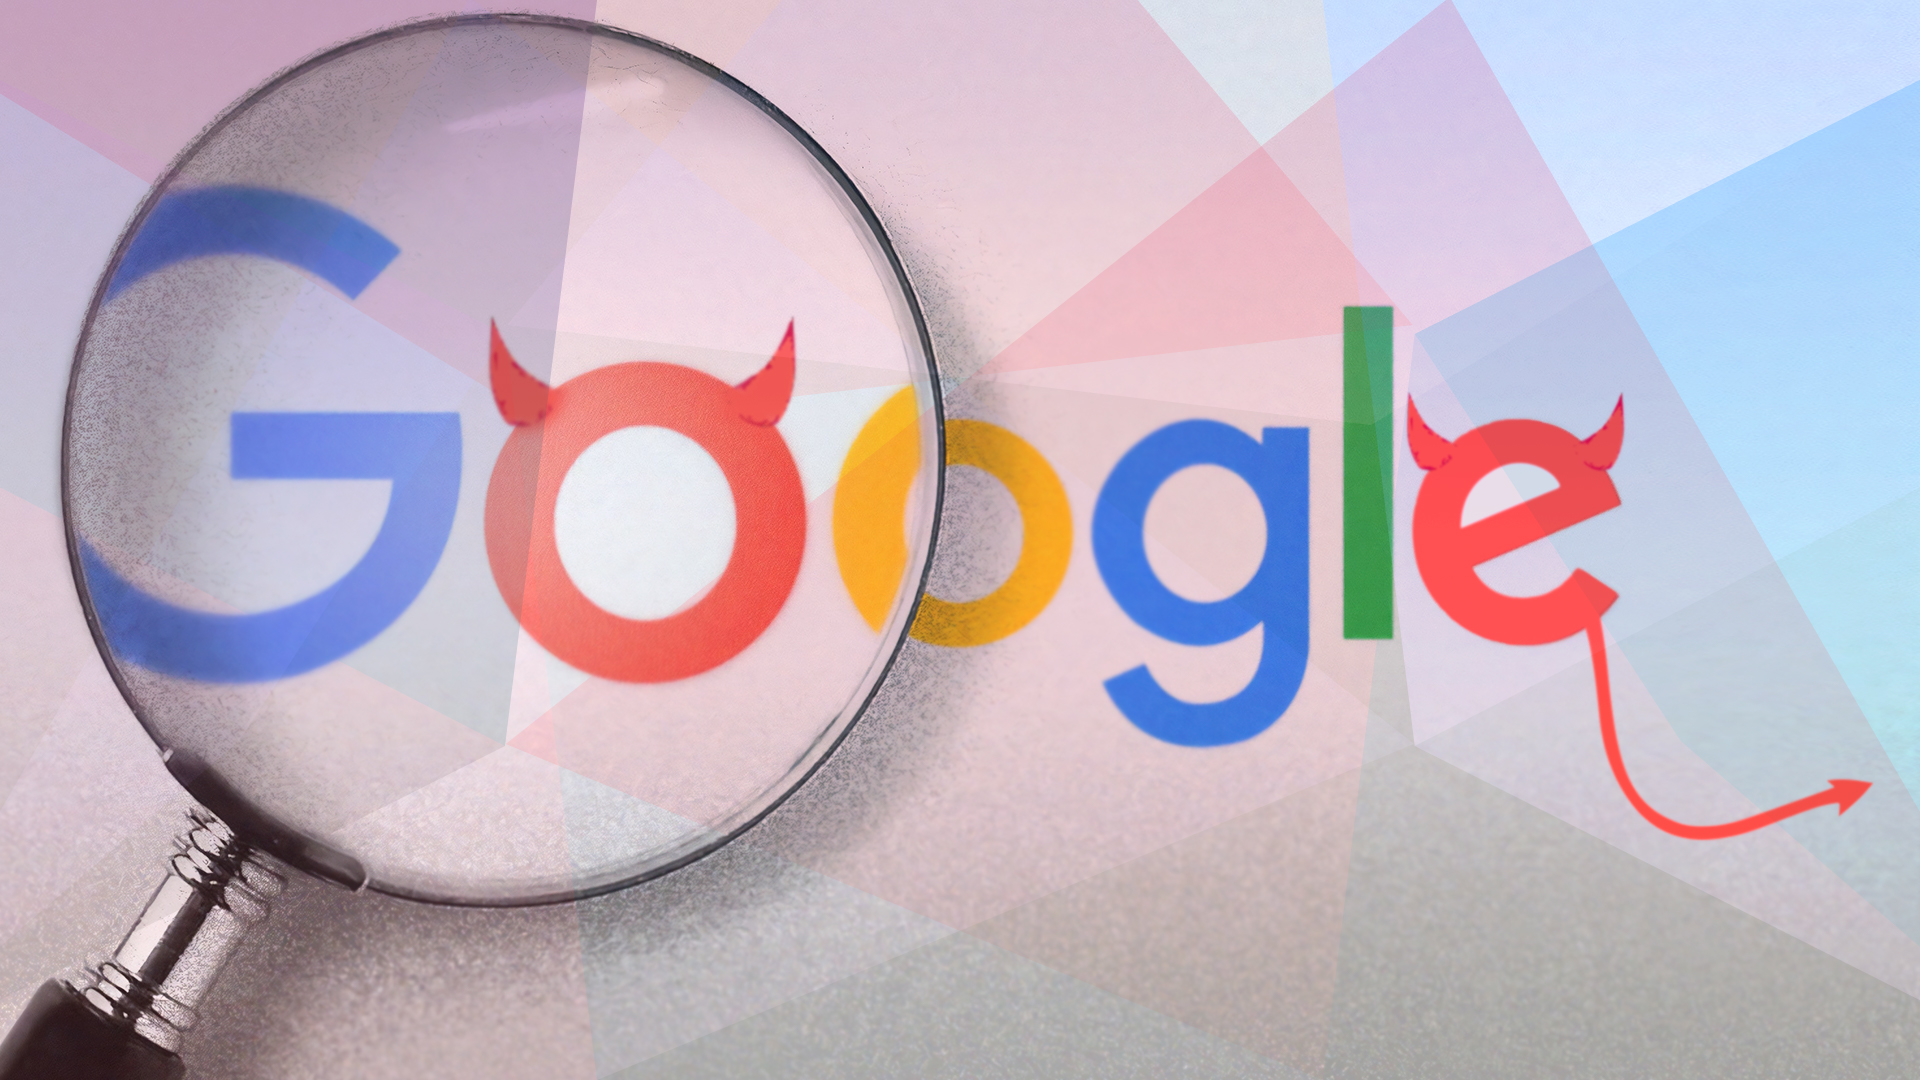 Google, Suchmaschine, Suche, Google Logo, Do No Evil, Google Evil, Böses Google